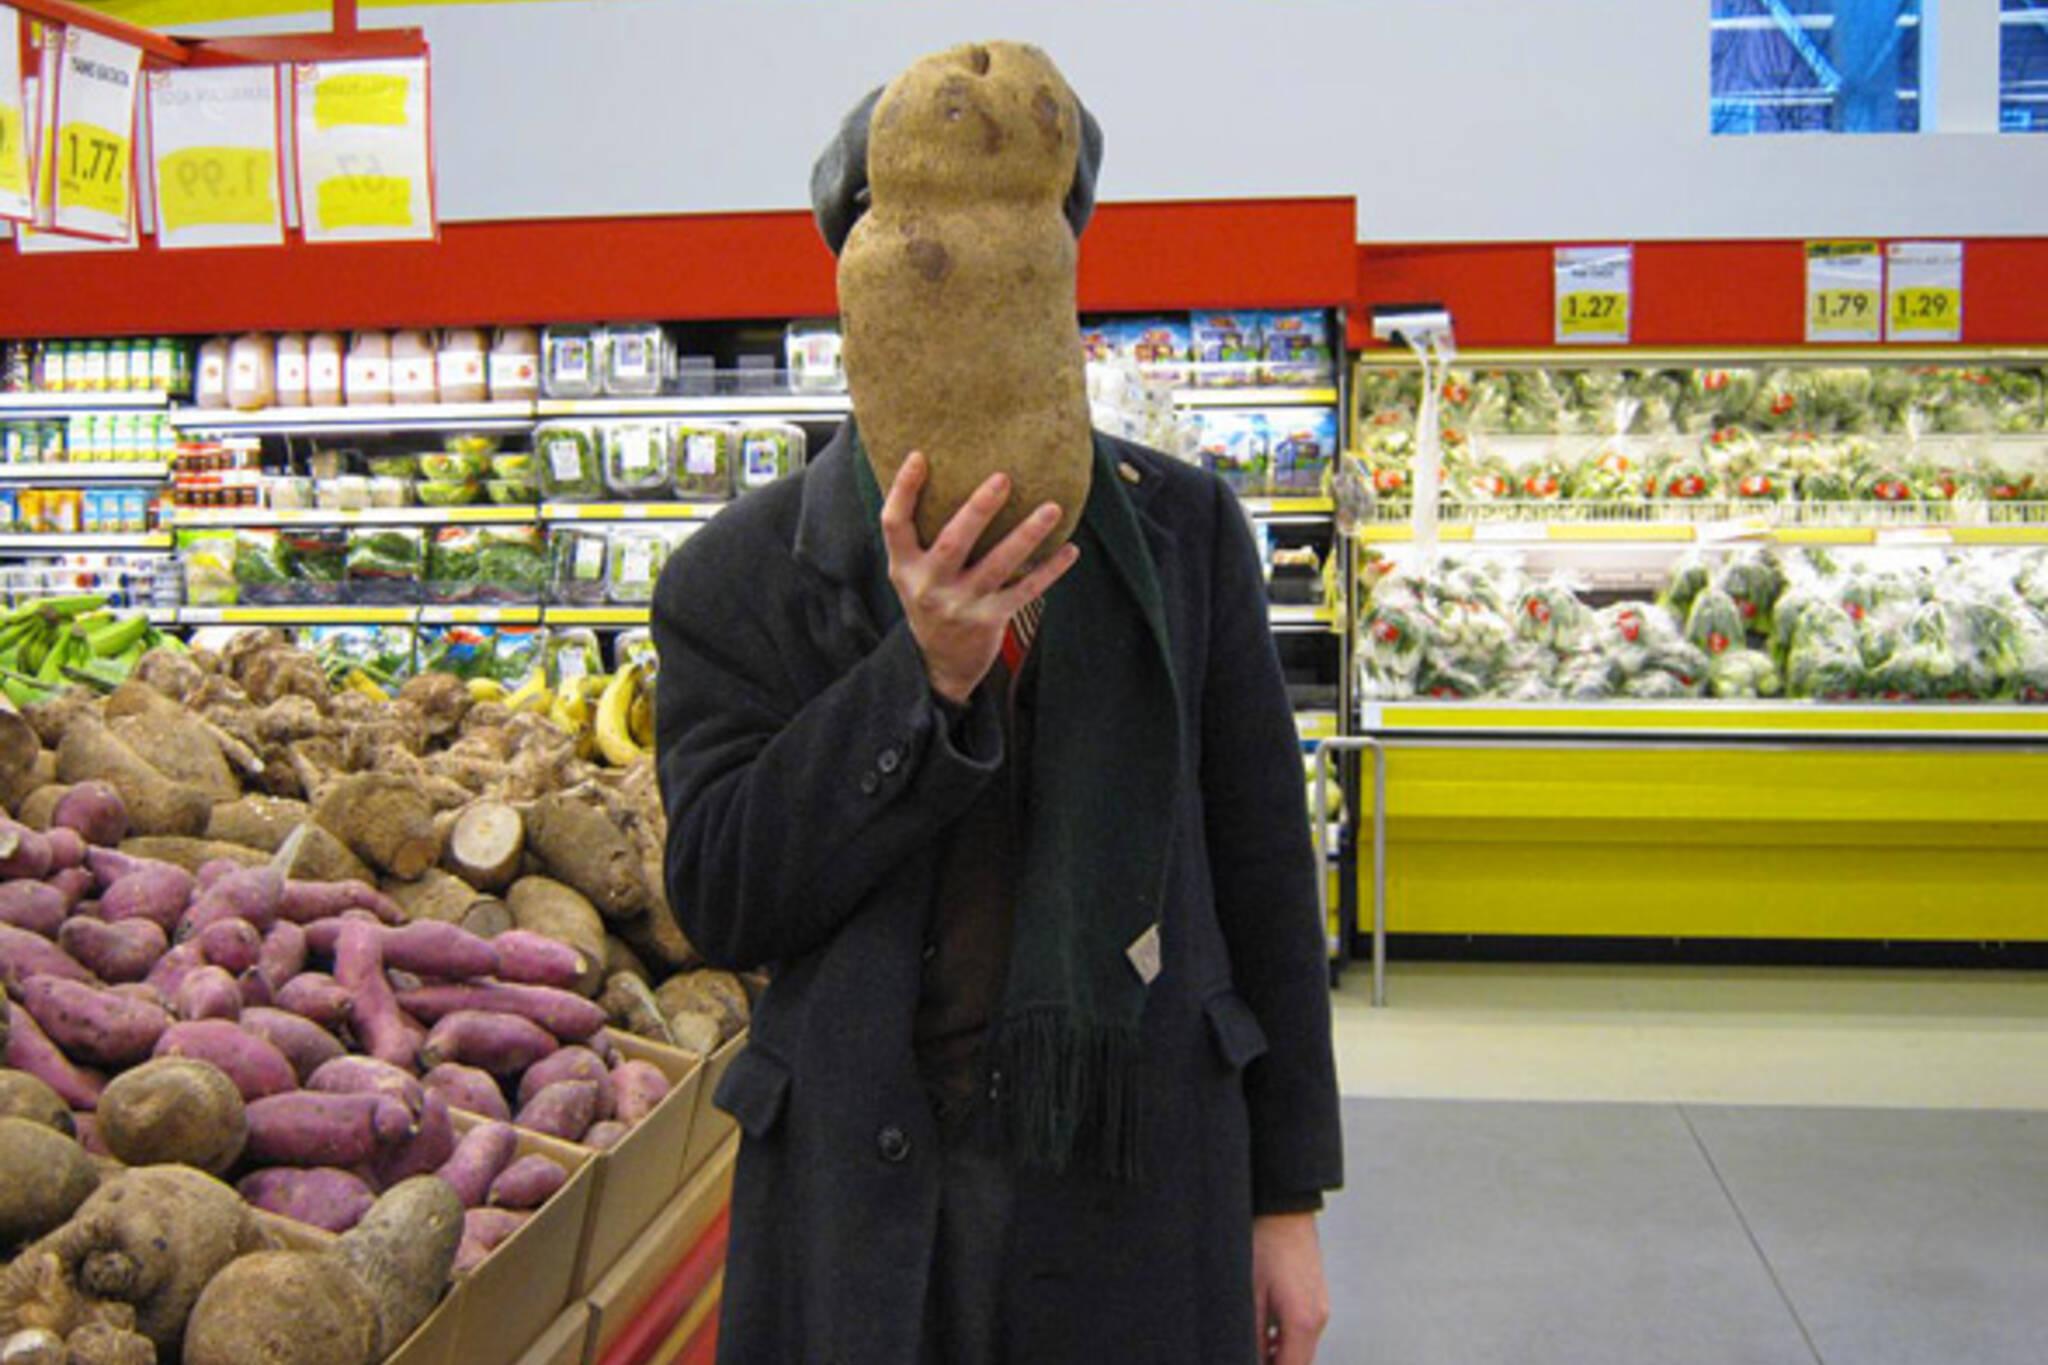 Huge potato